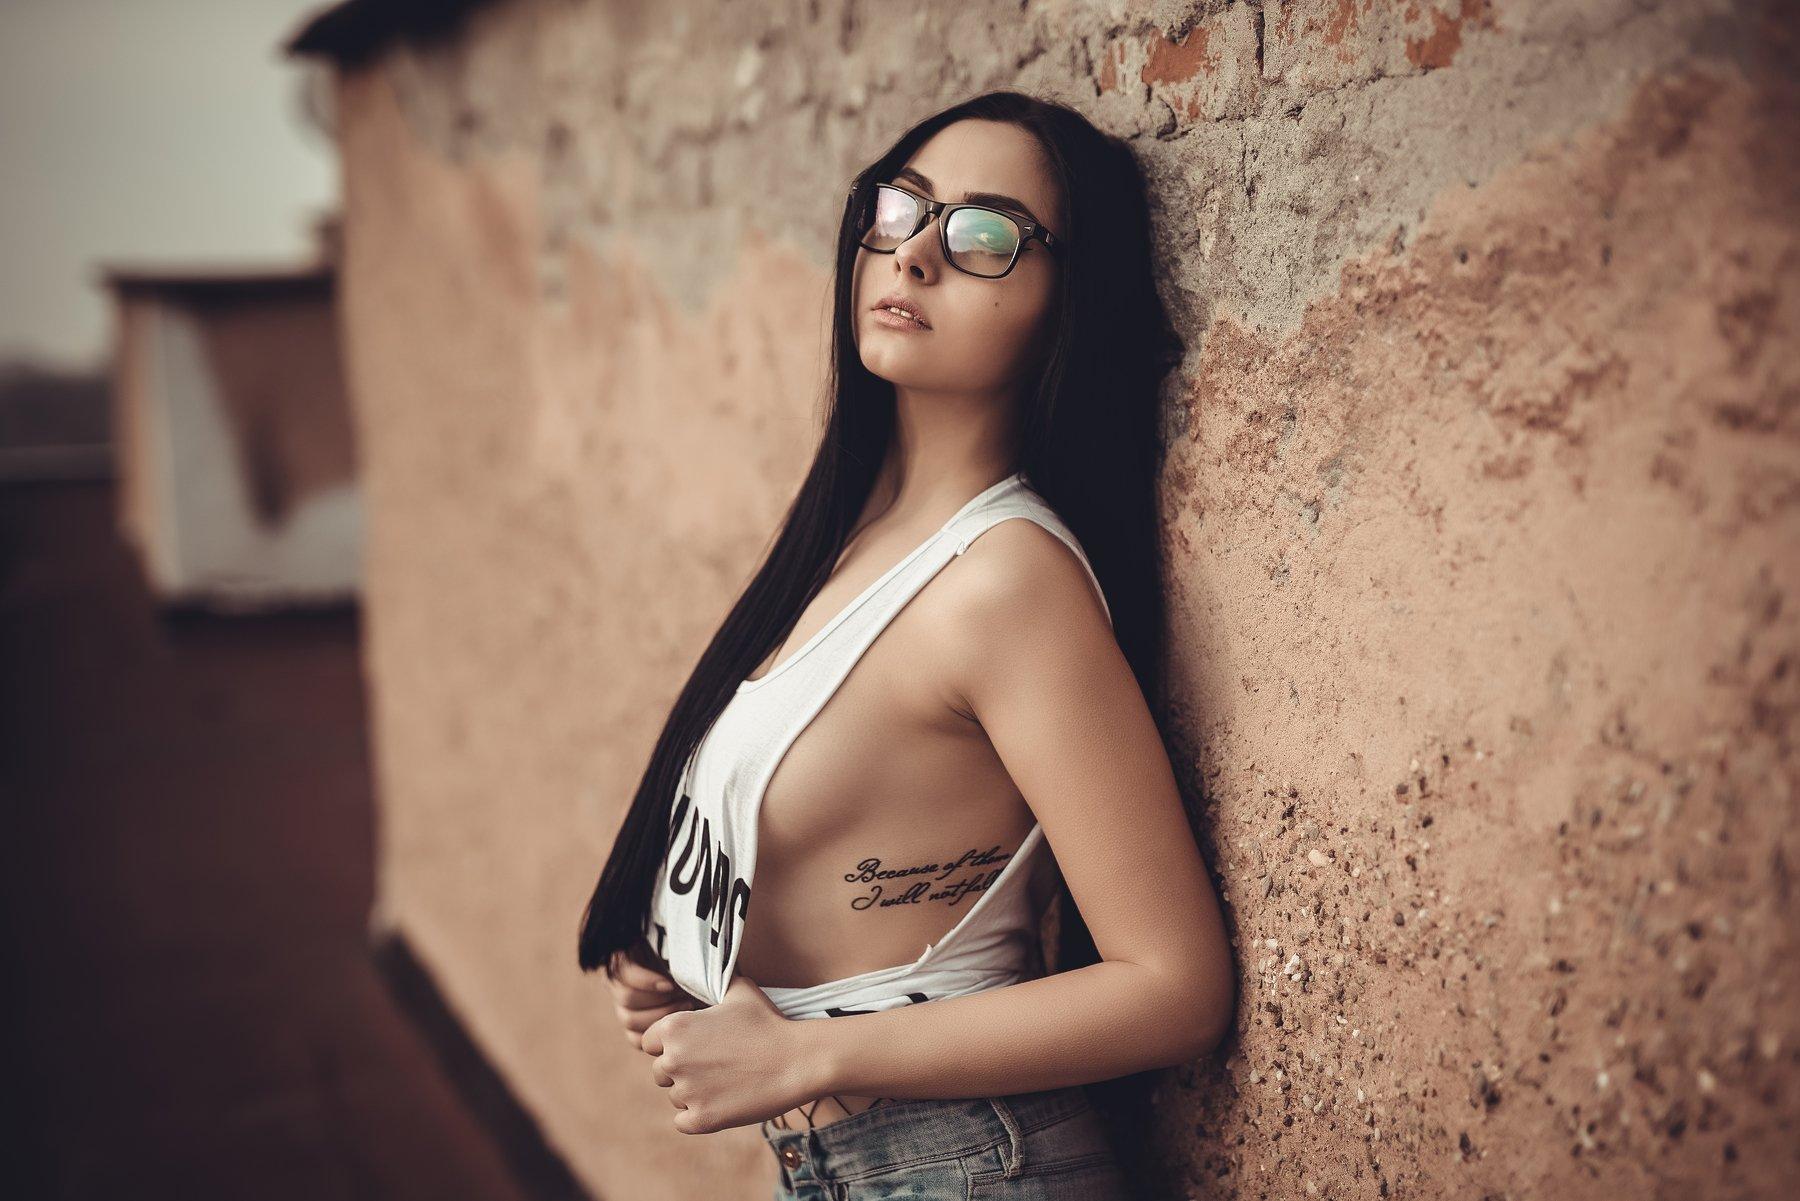 sexy, model, fashion, erotic, lips, body, fabric, retouch, sunset, tatoo, glasses, Atanas Petkov